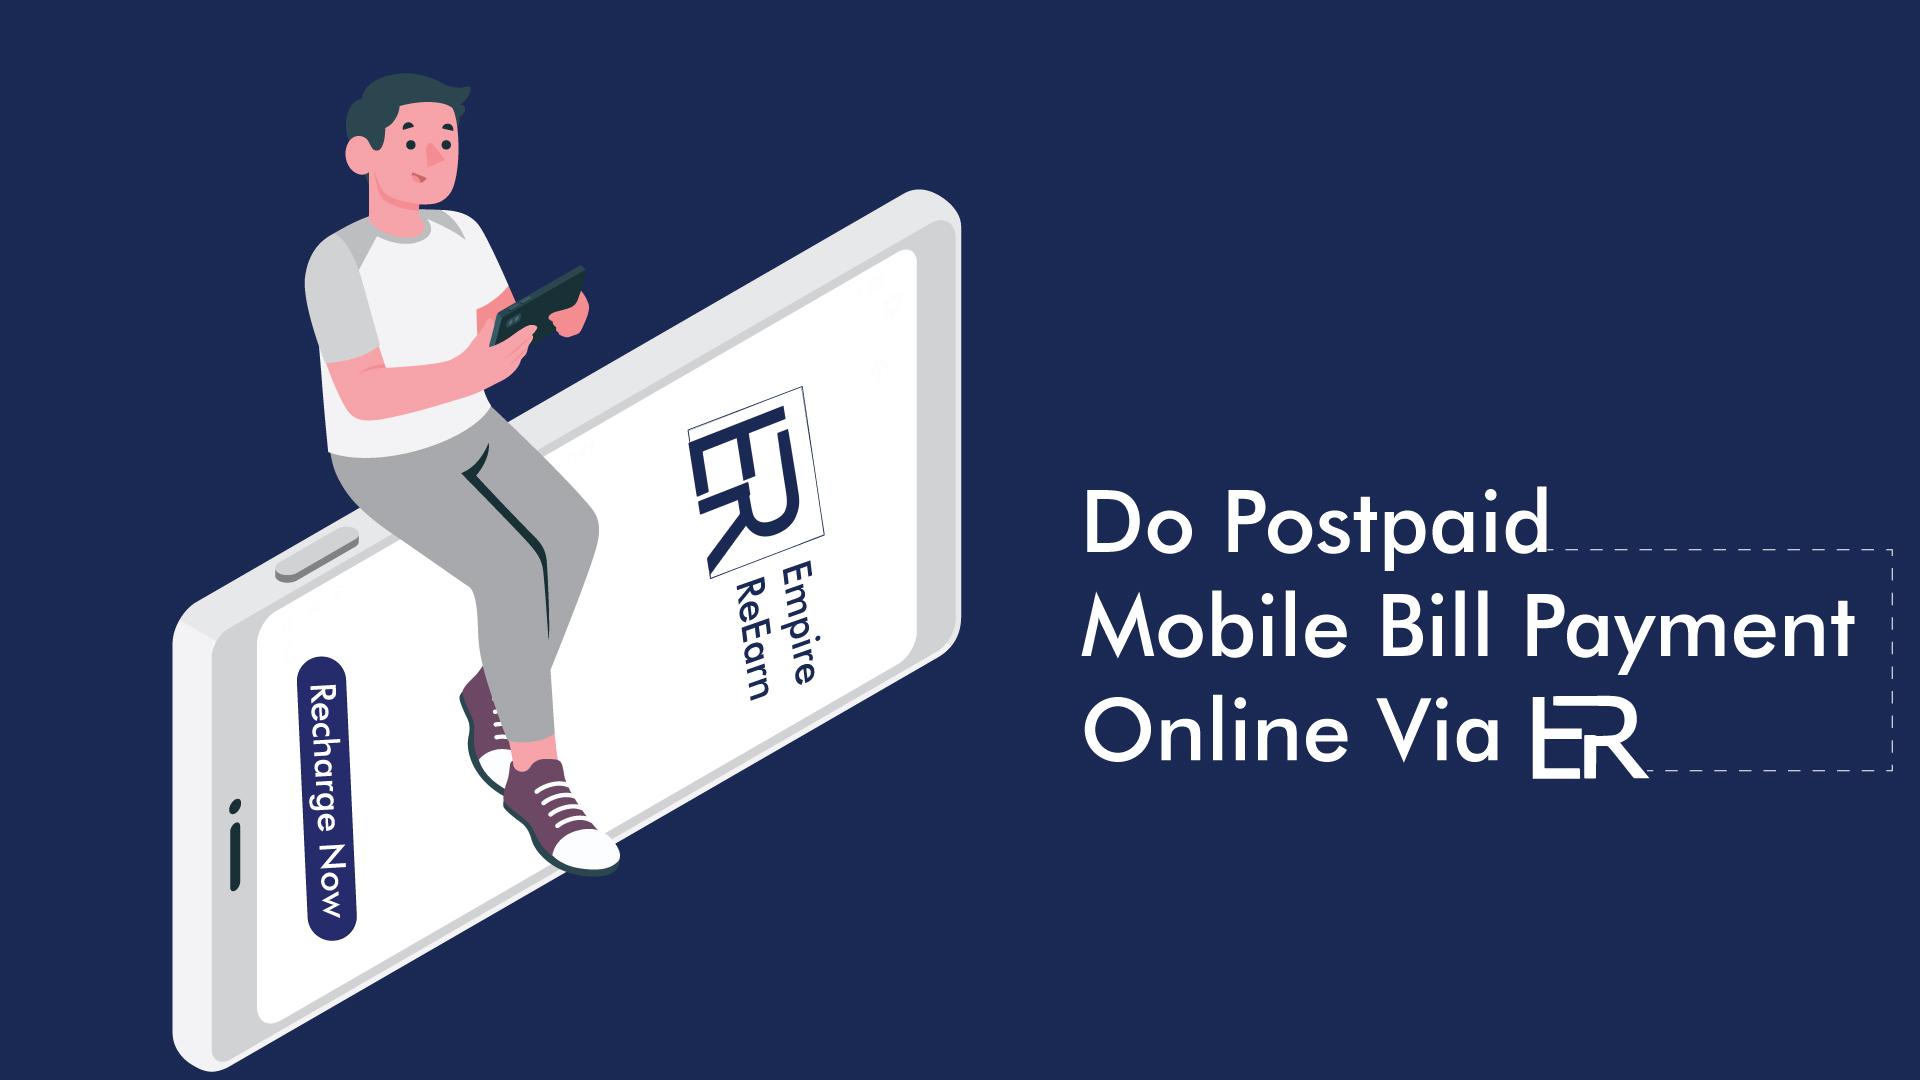 Do Postpaid Mobile Bill Payment Online Via Empire ReEarn